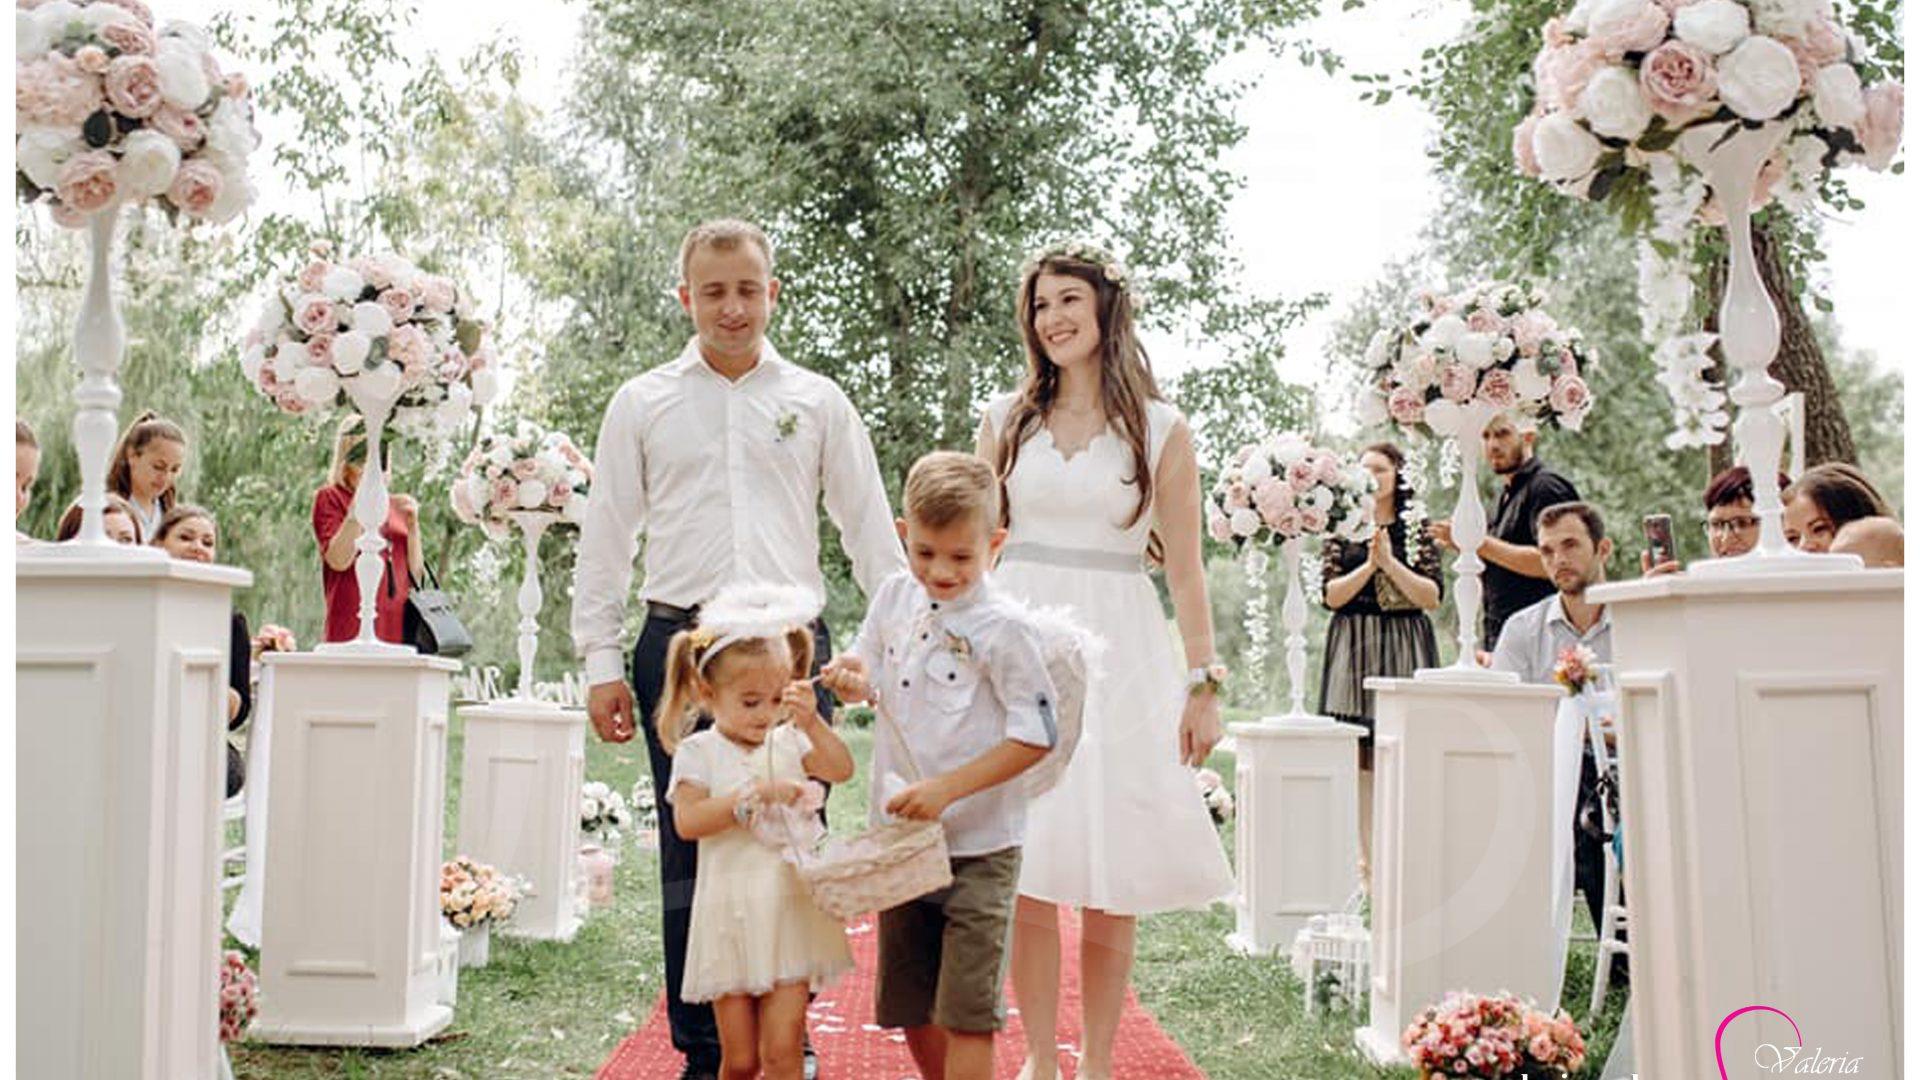 Inregistrarea casatoriei sub cerul liber Agentia Valeria Mariage 069787665 www.valeria (14)